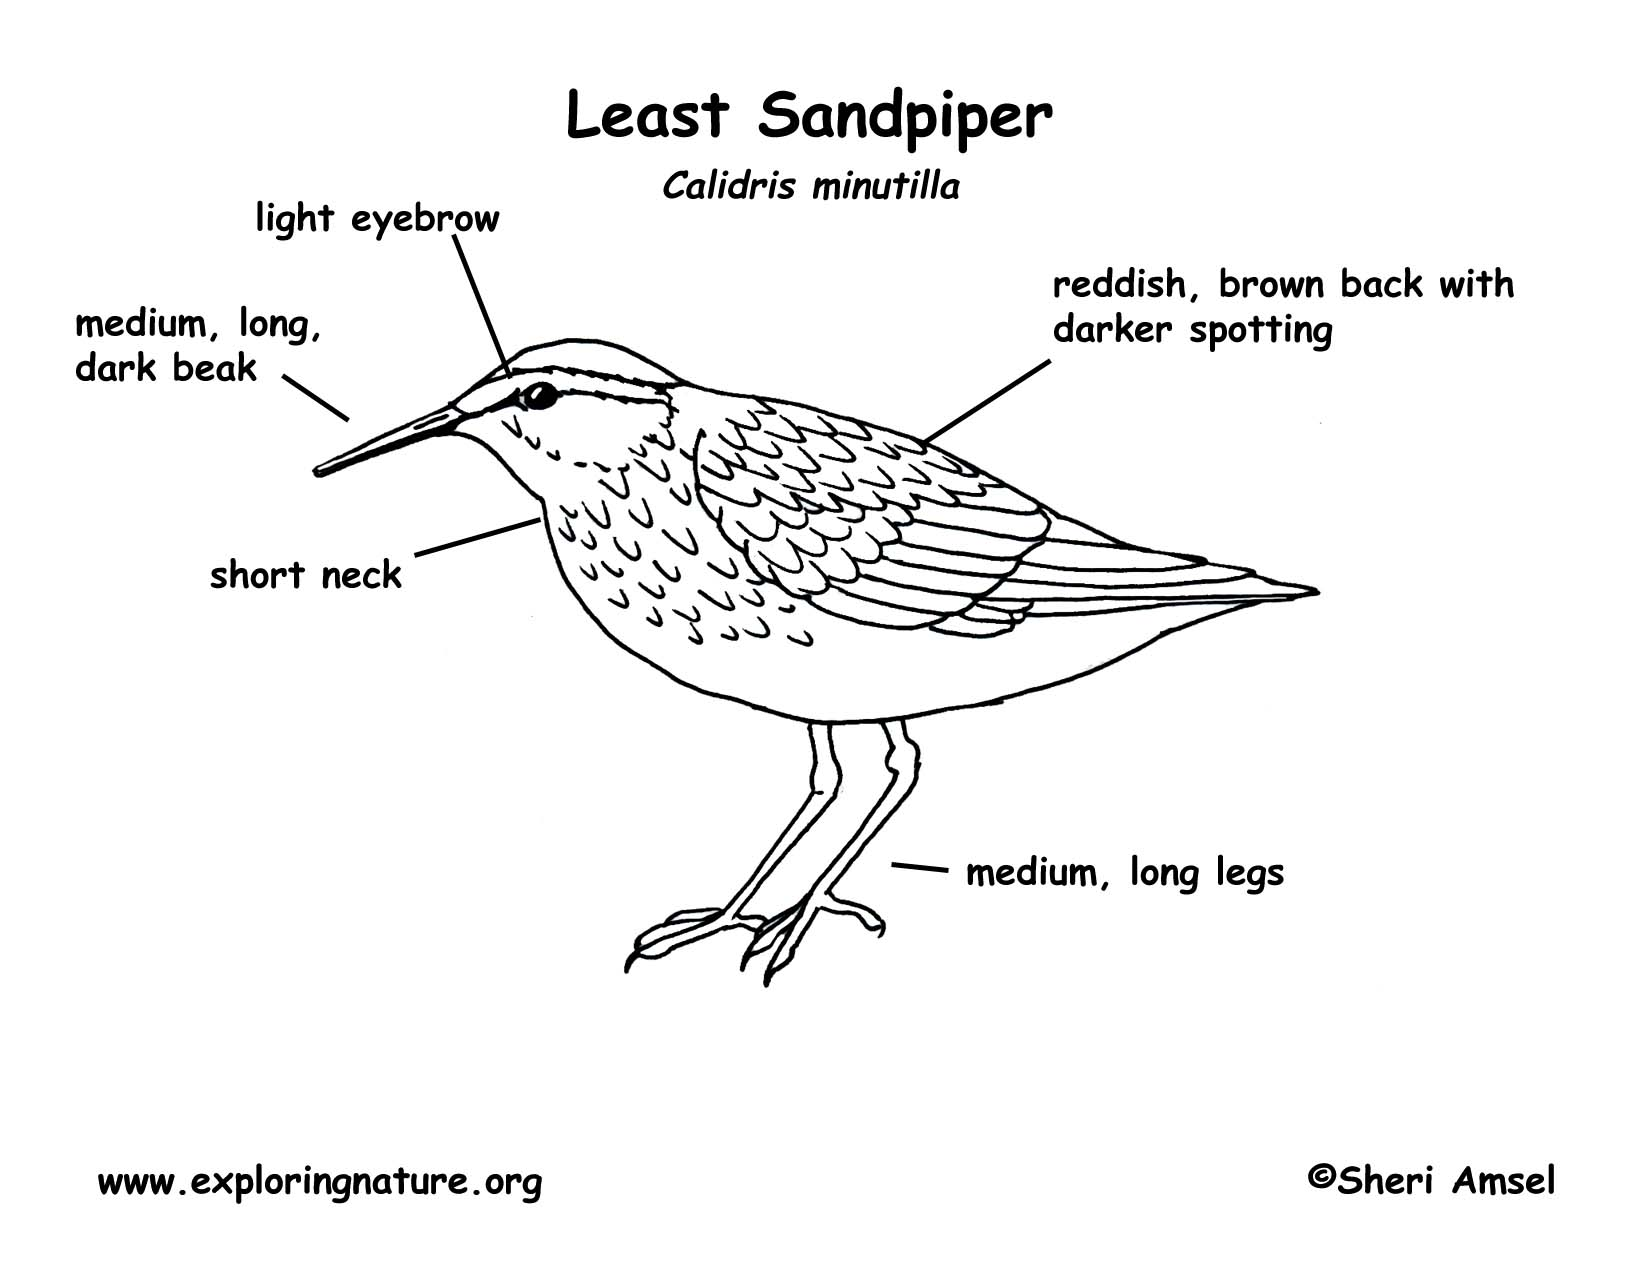 Sandpiper Least